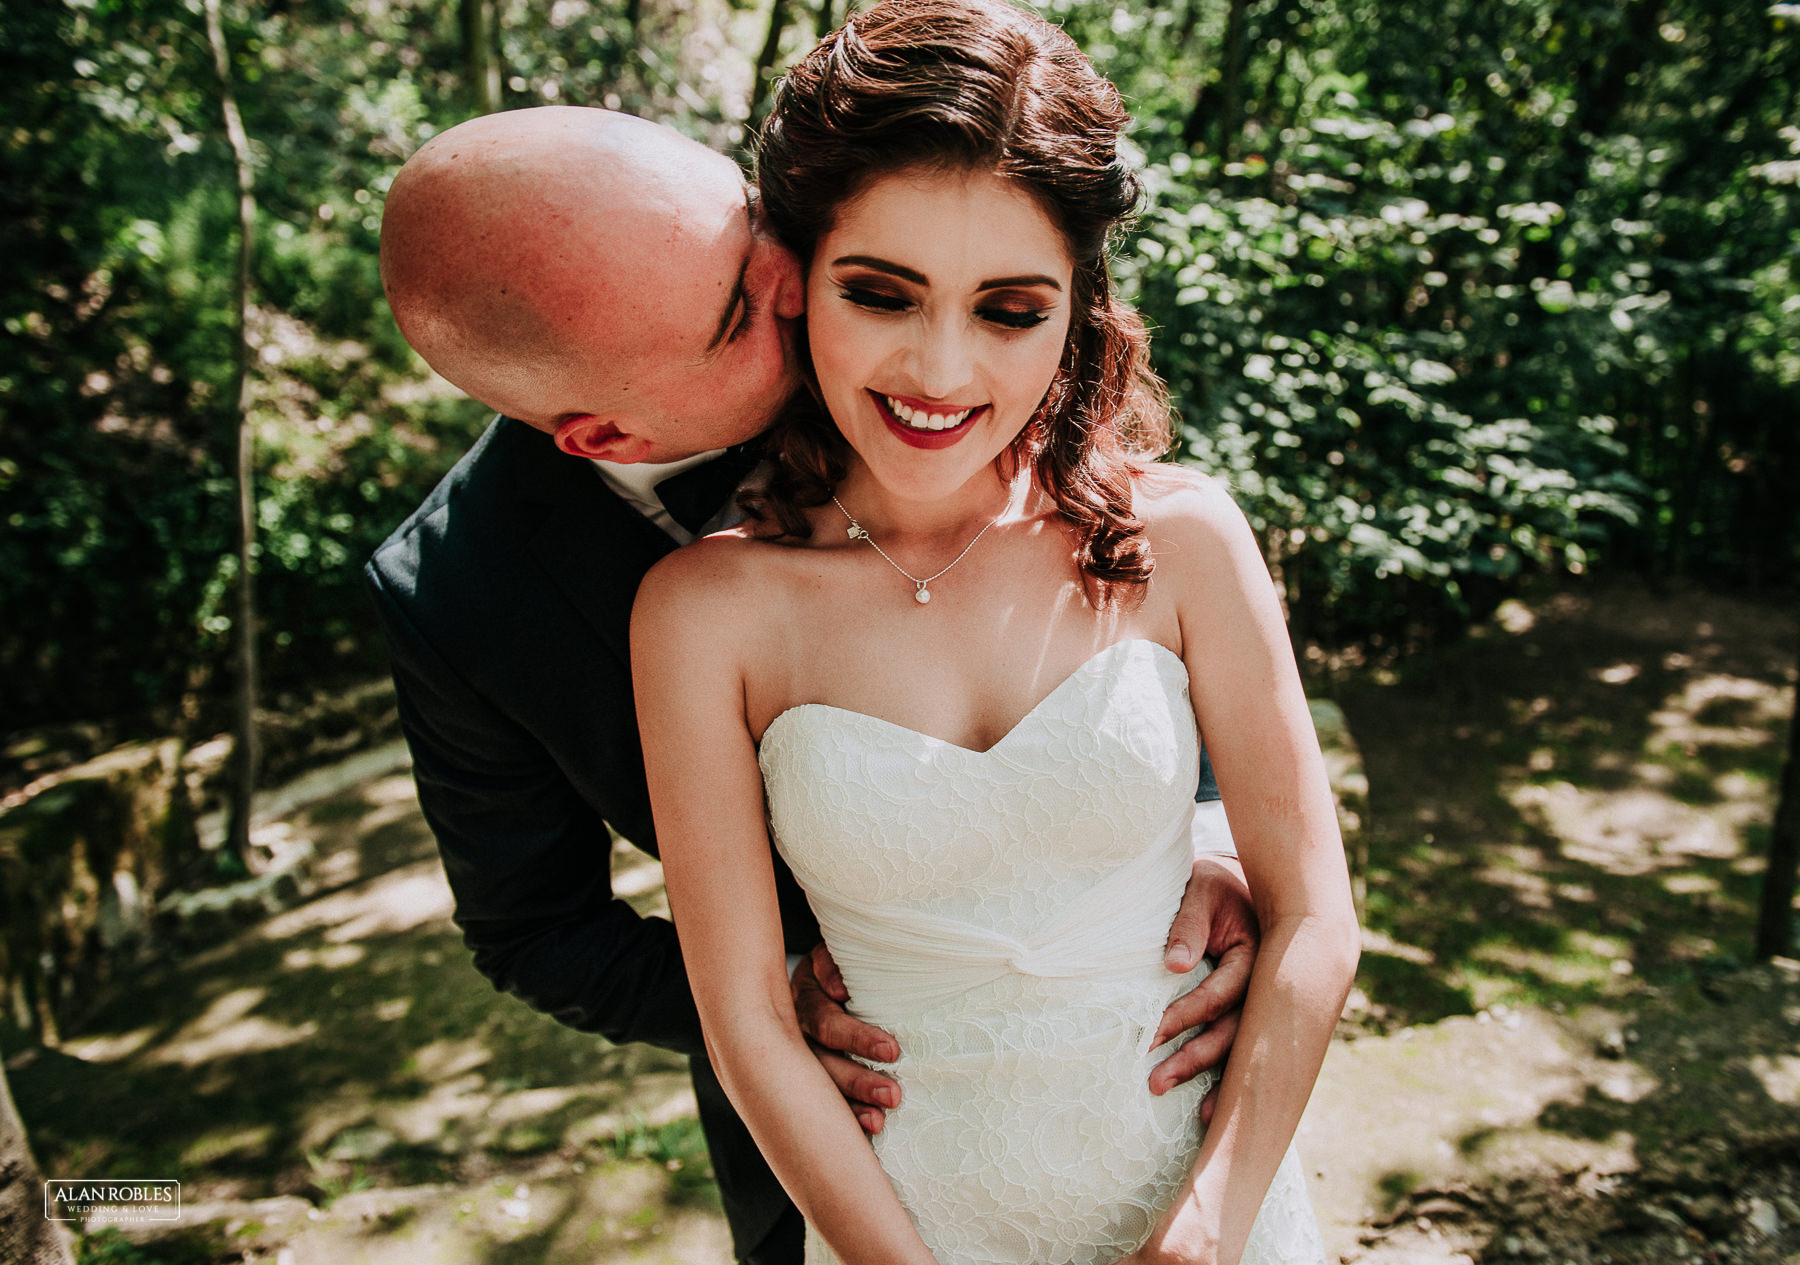 Fotografo de bodas guadalajara Alan Robles - Pinare terraza bistro 14